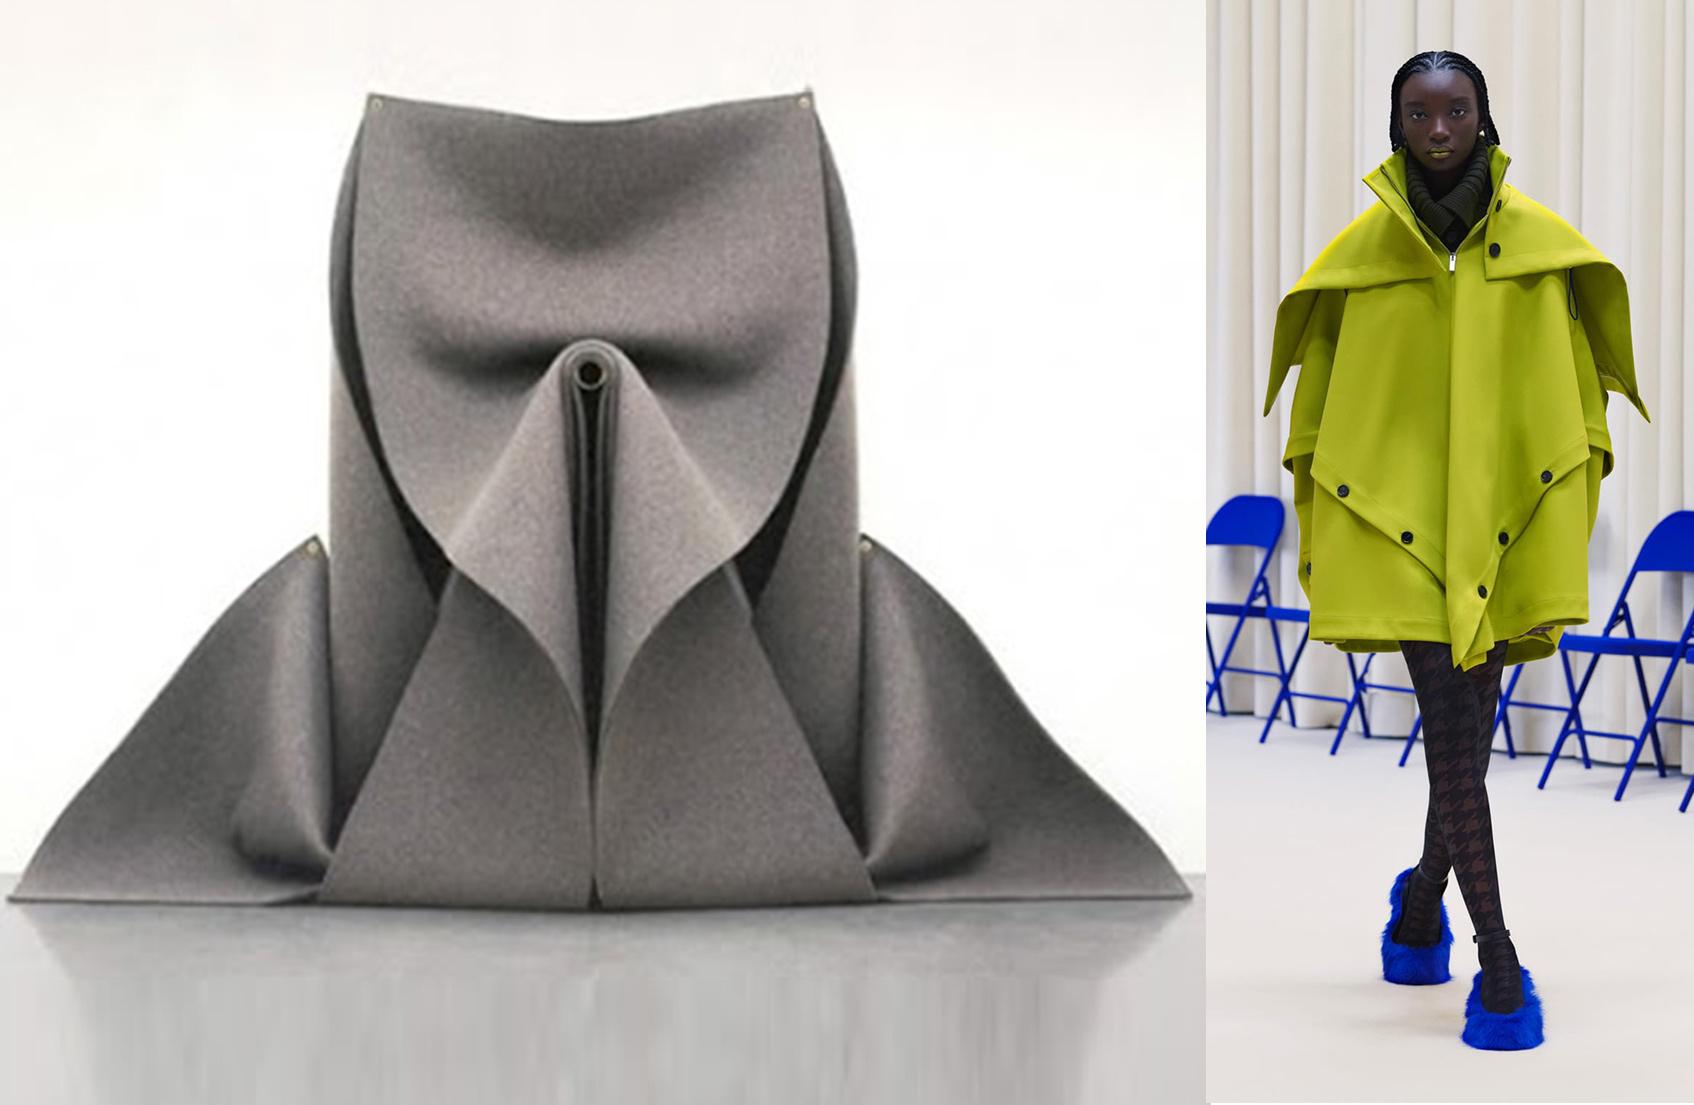 Скульптура из фетра без названия, Роберт Моррис, 1976; Nina Ricci осень-зима 21/22